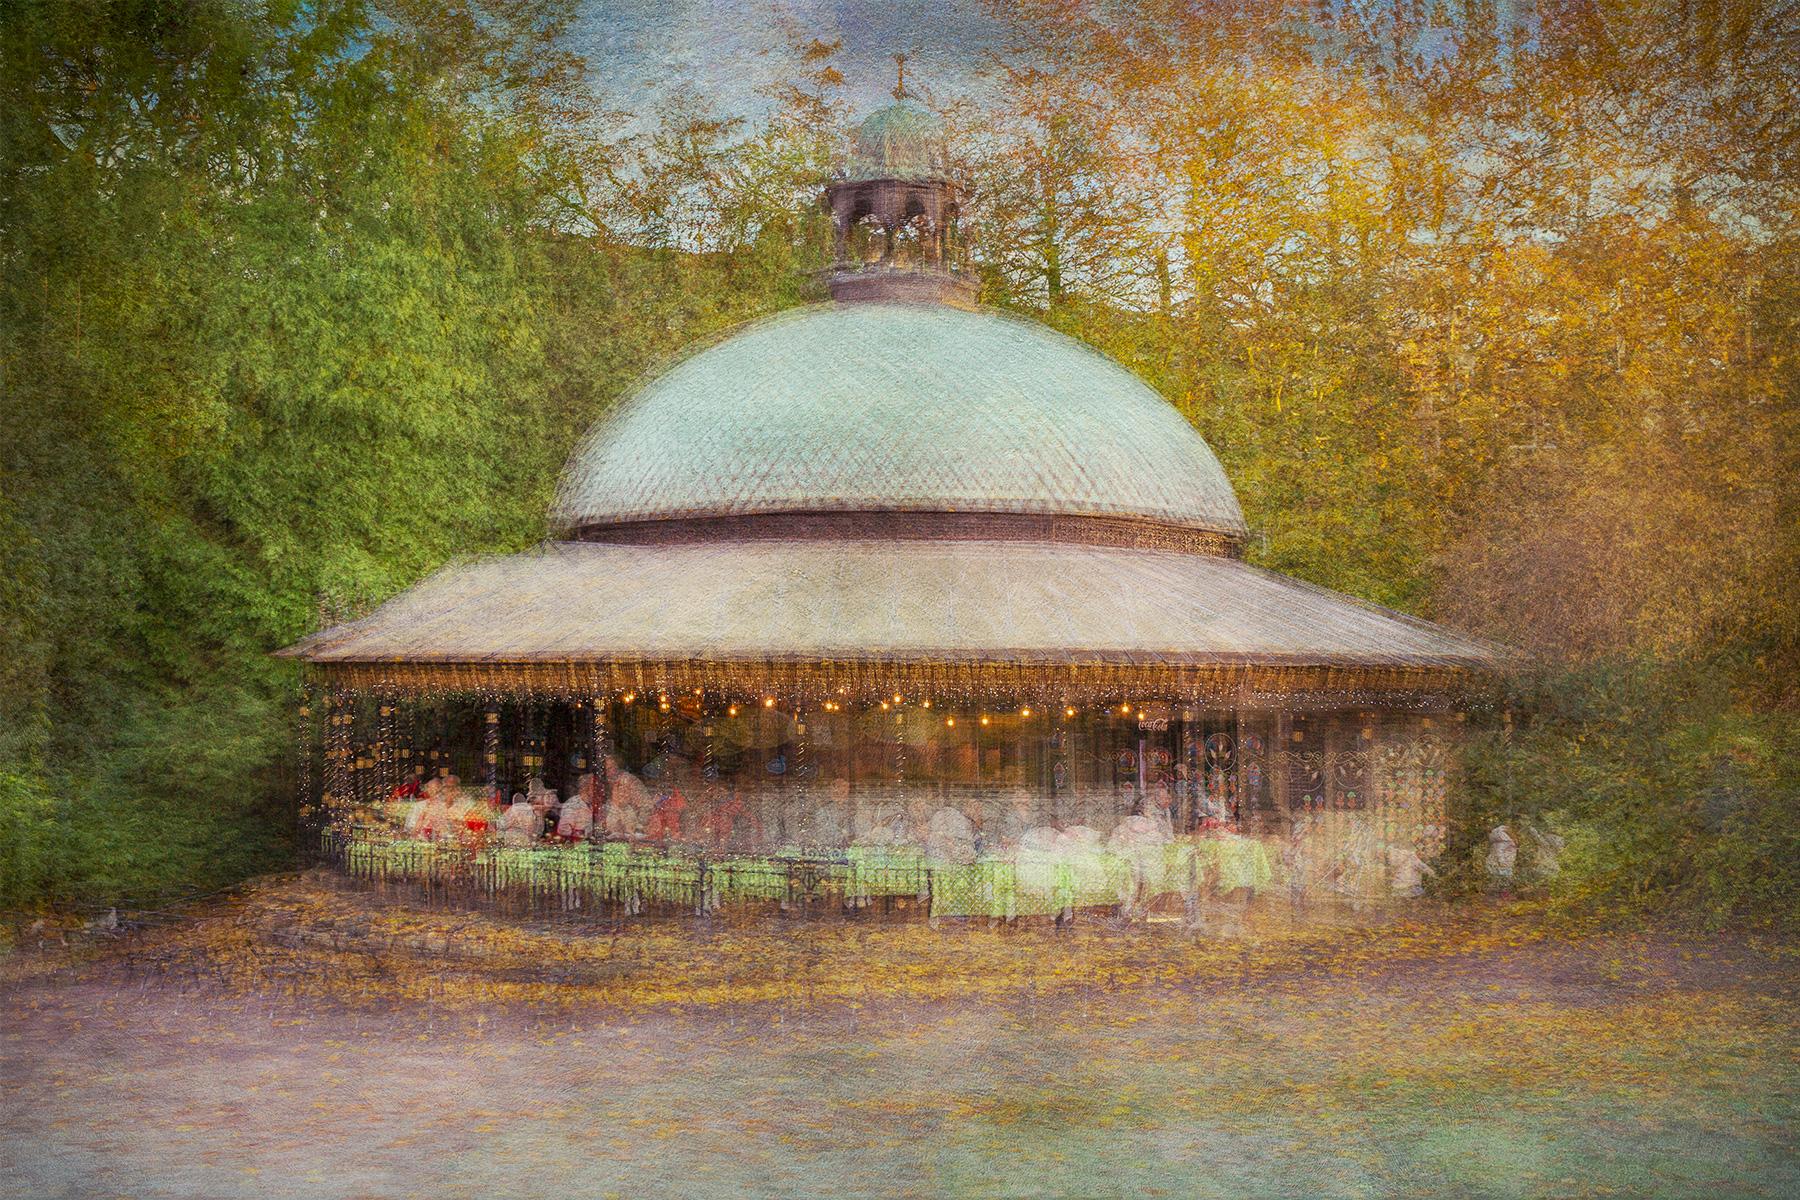 C-z-Tea-in-The-Valley-Gardens-T175-copy.jpg